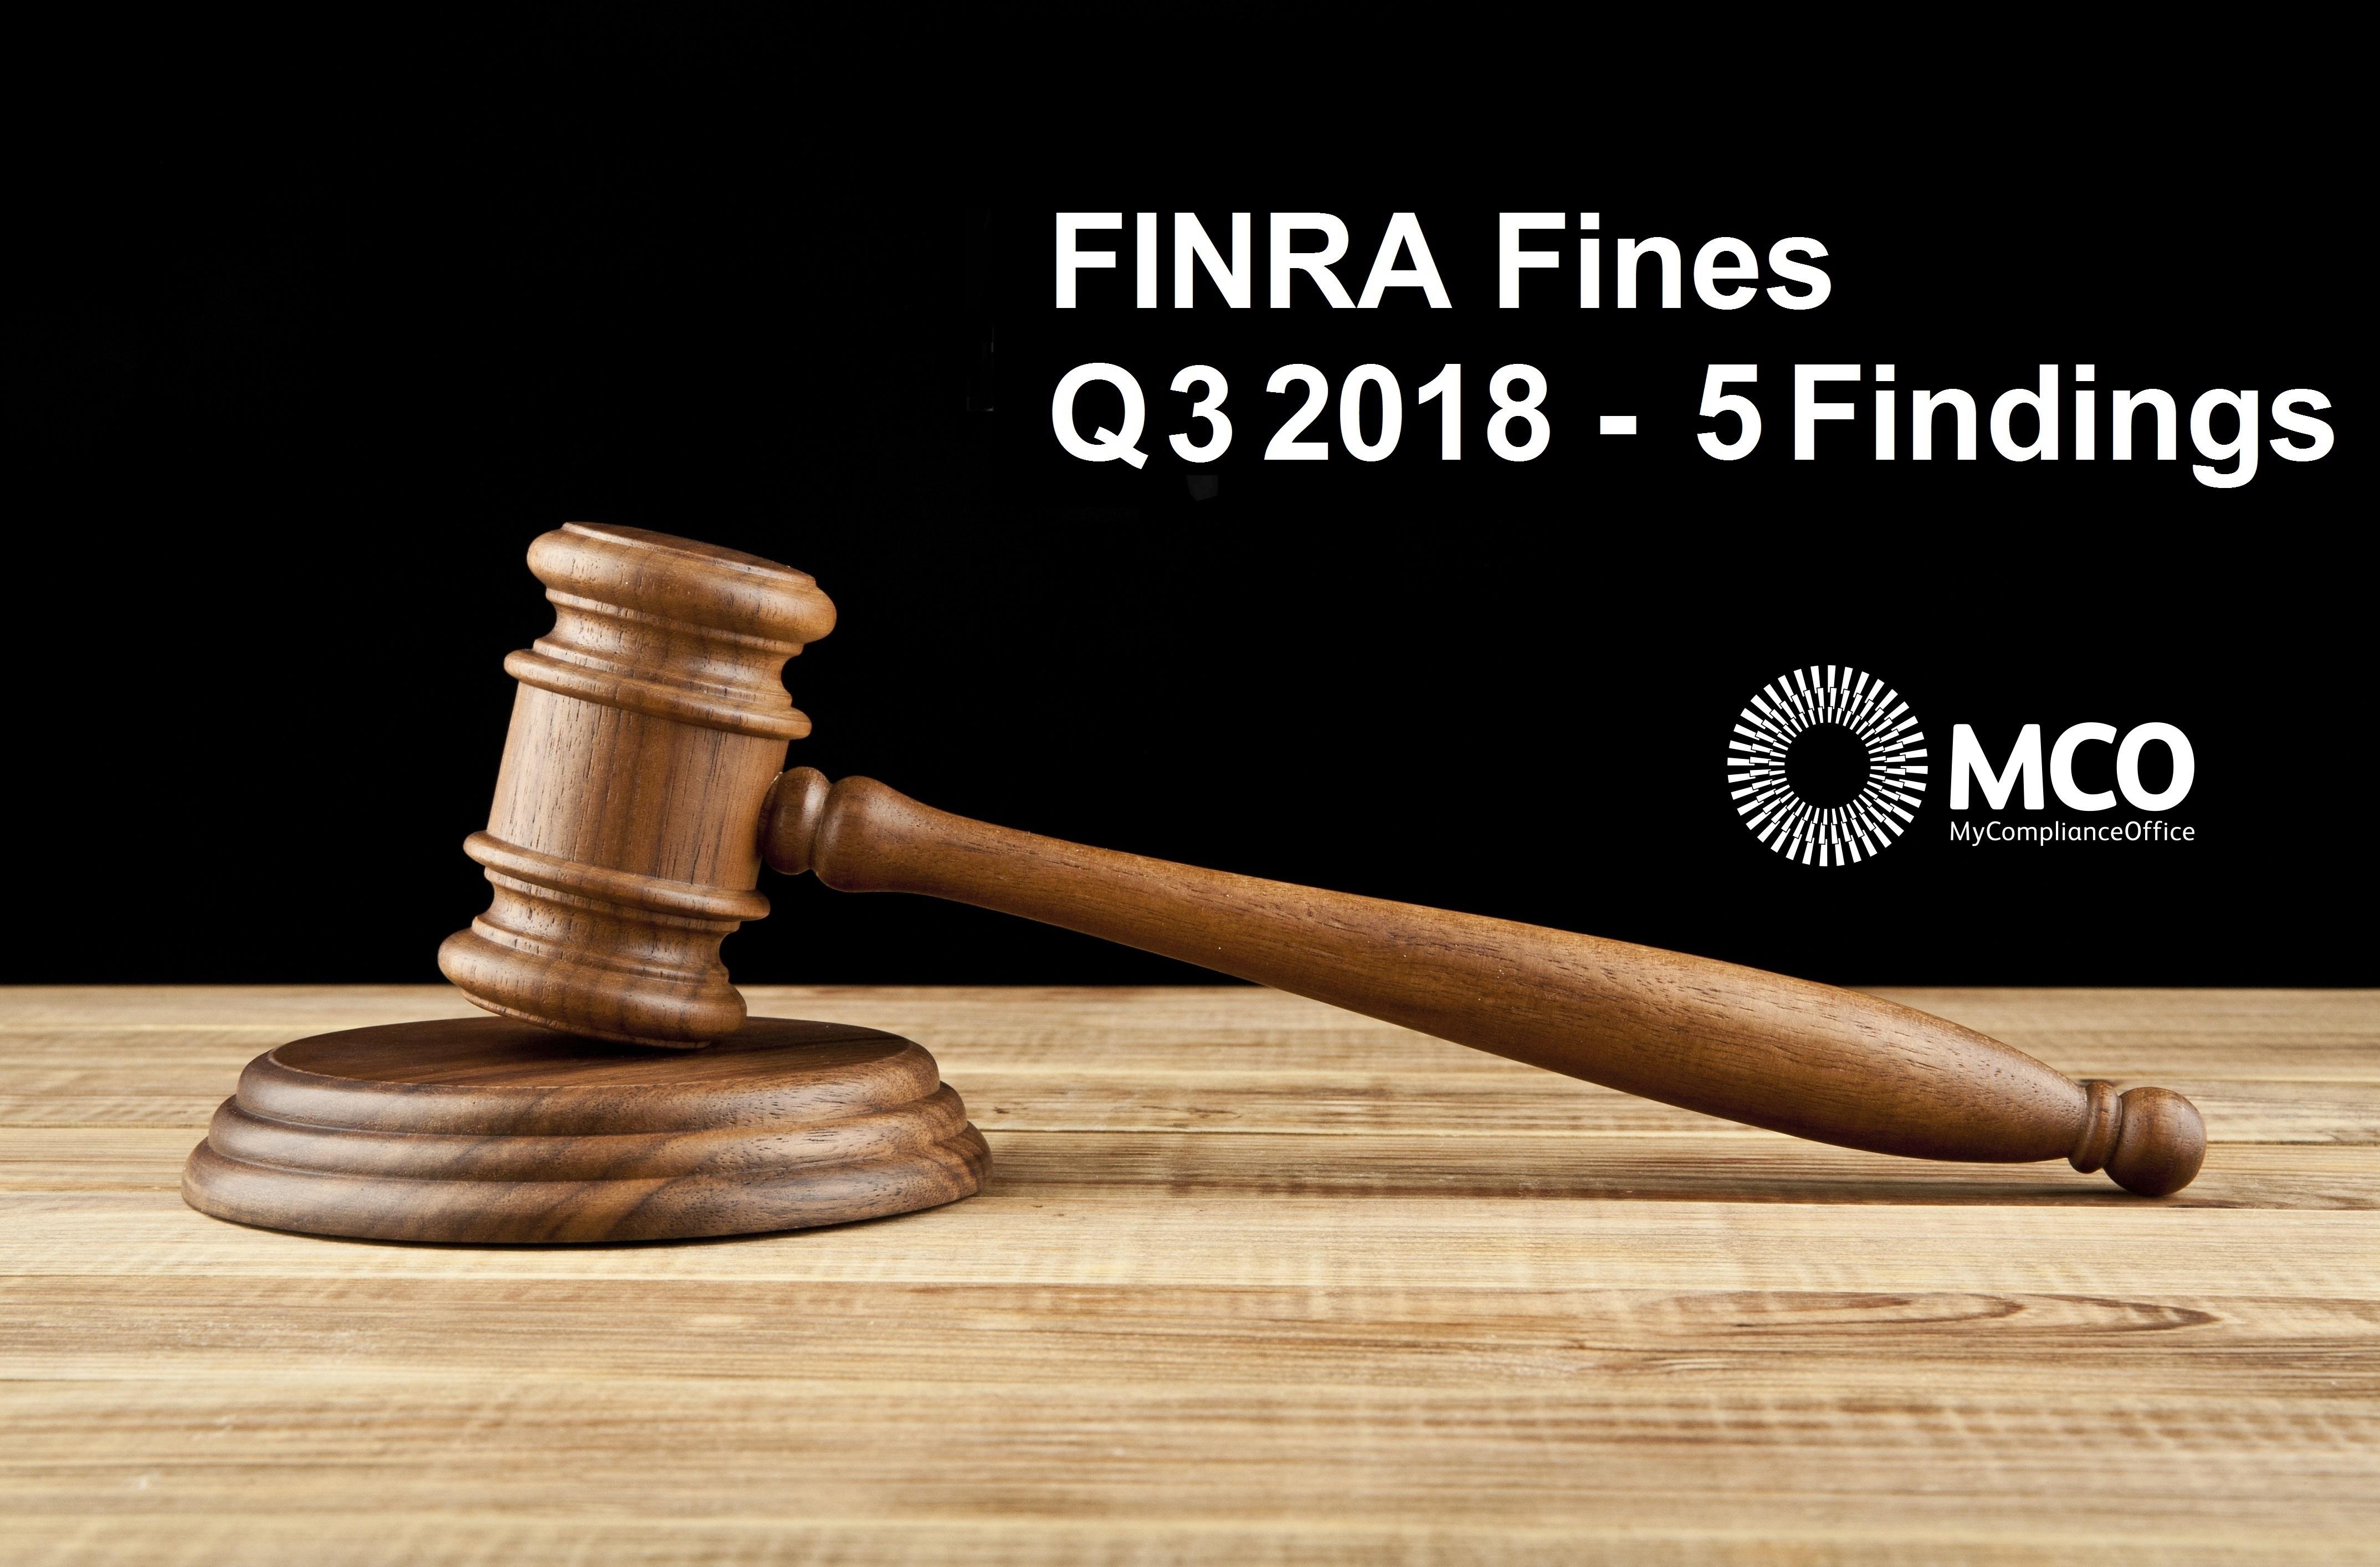 FINRA_Fines_2018 Q3